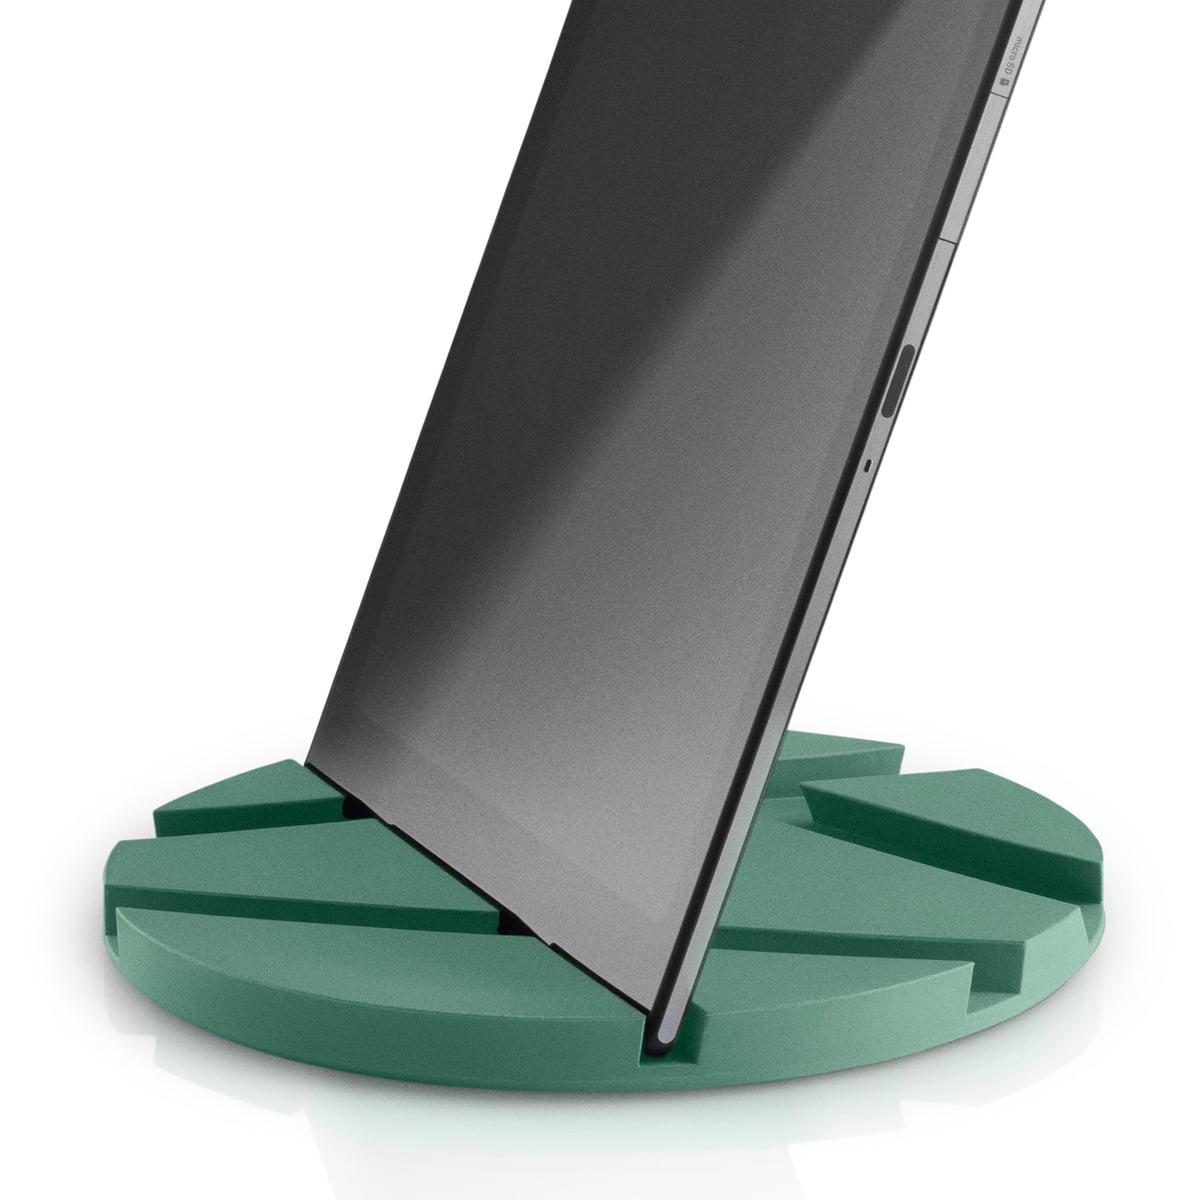 smartmat by eva solo in the interior design shop. Black Bedroom Furniture Sets. Home Design Ideas